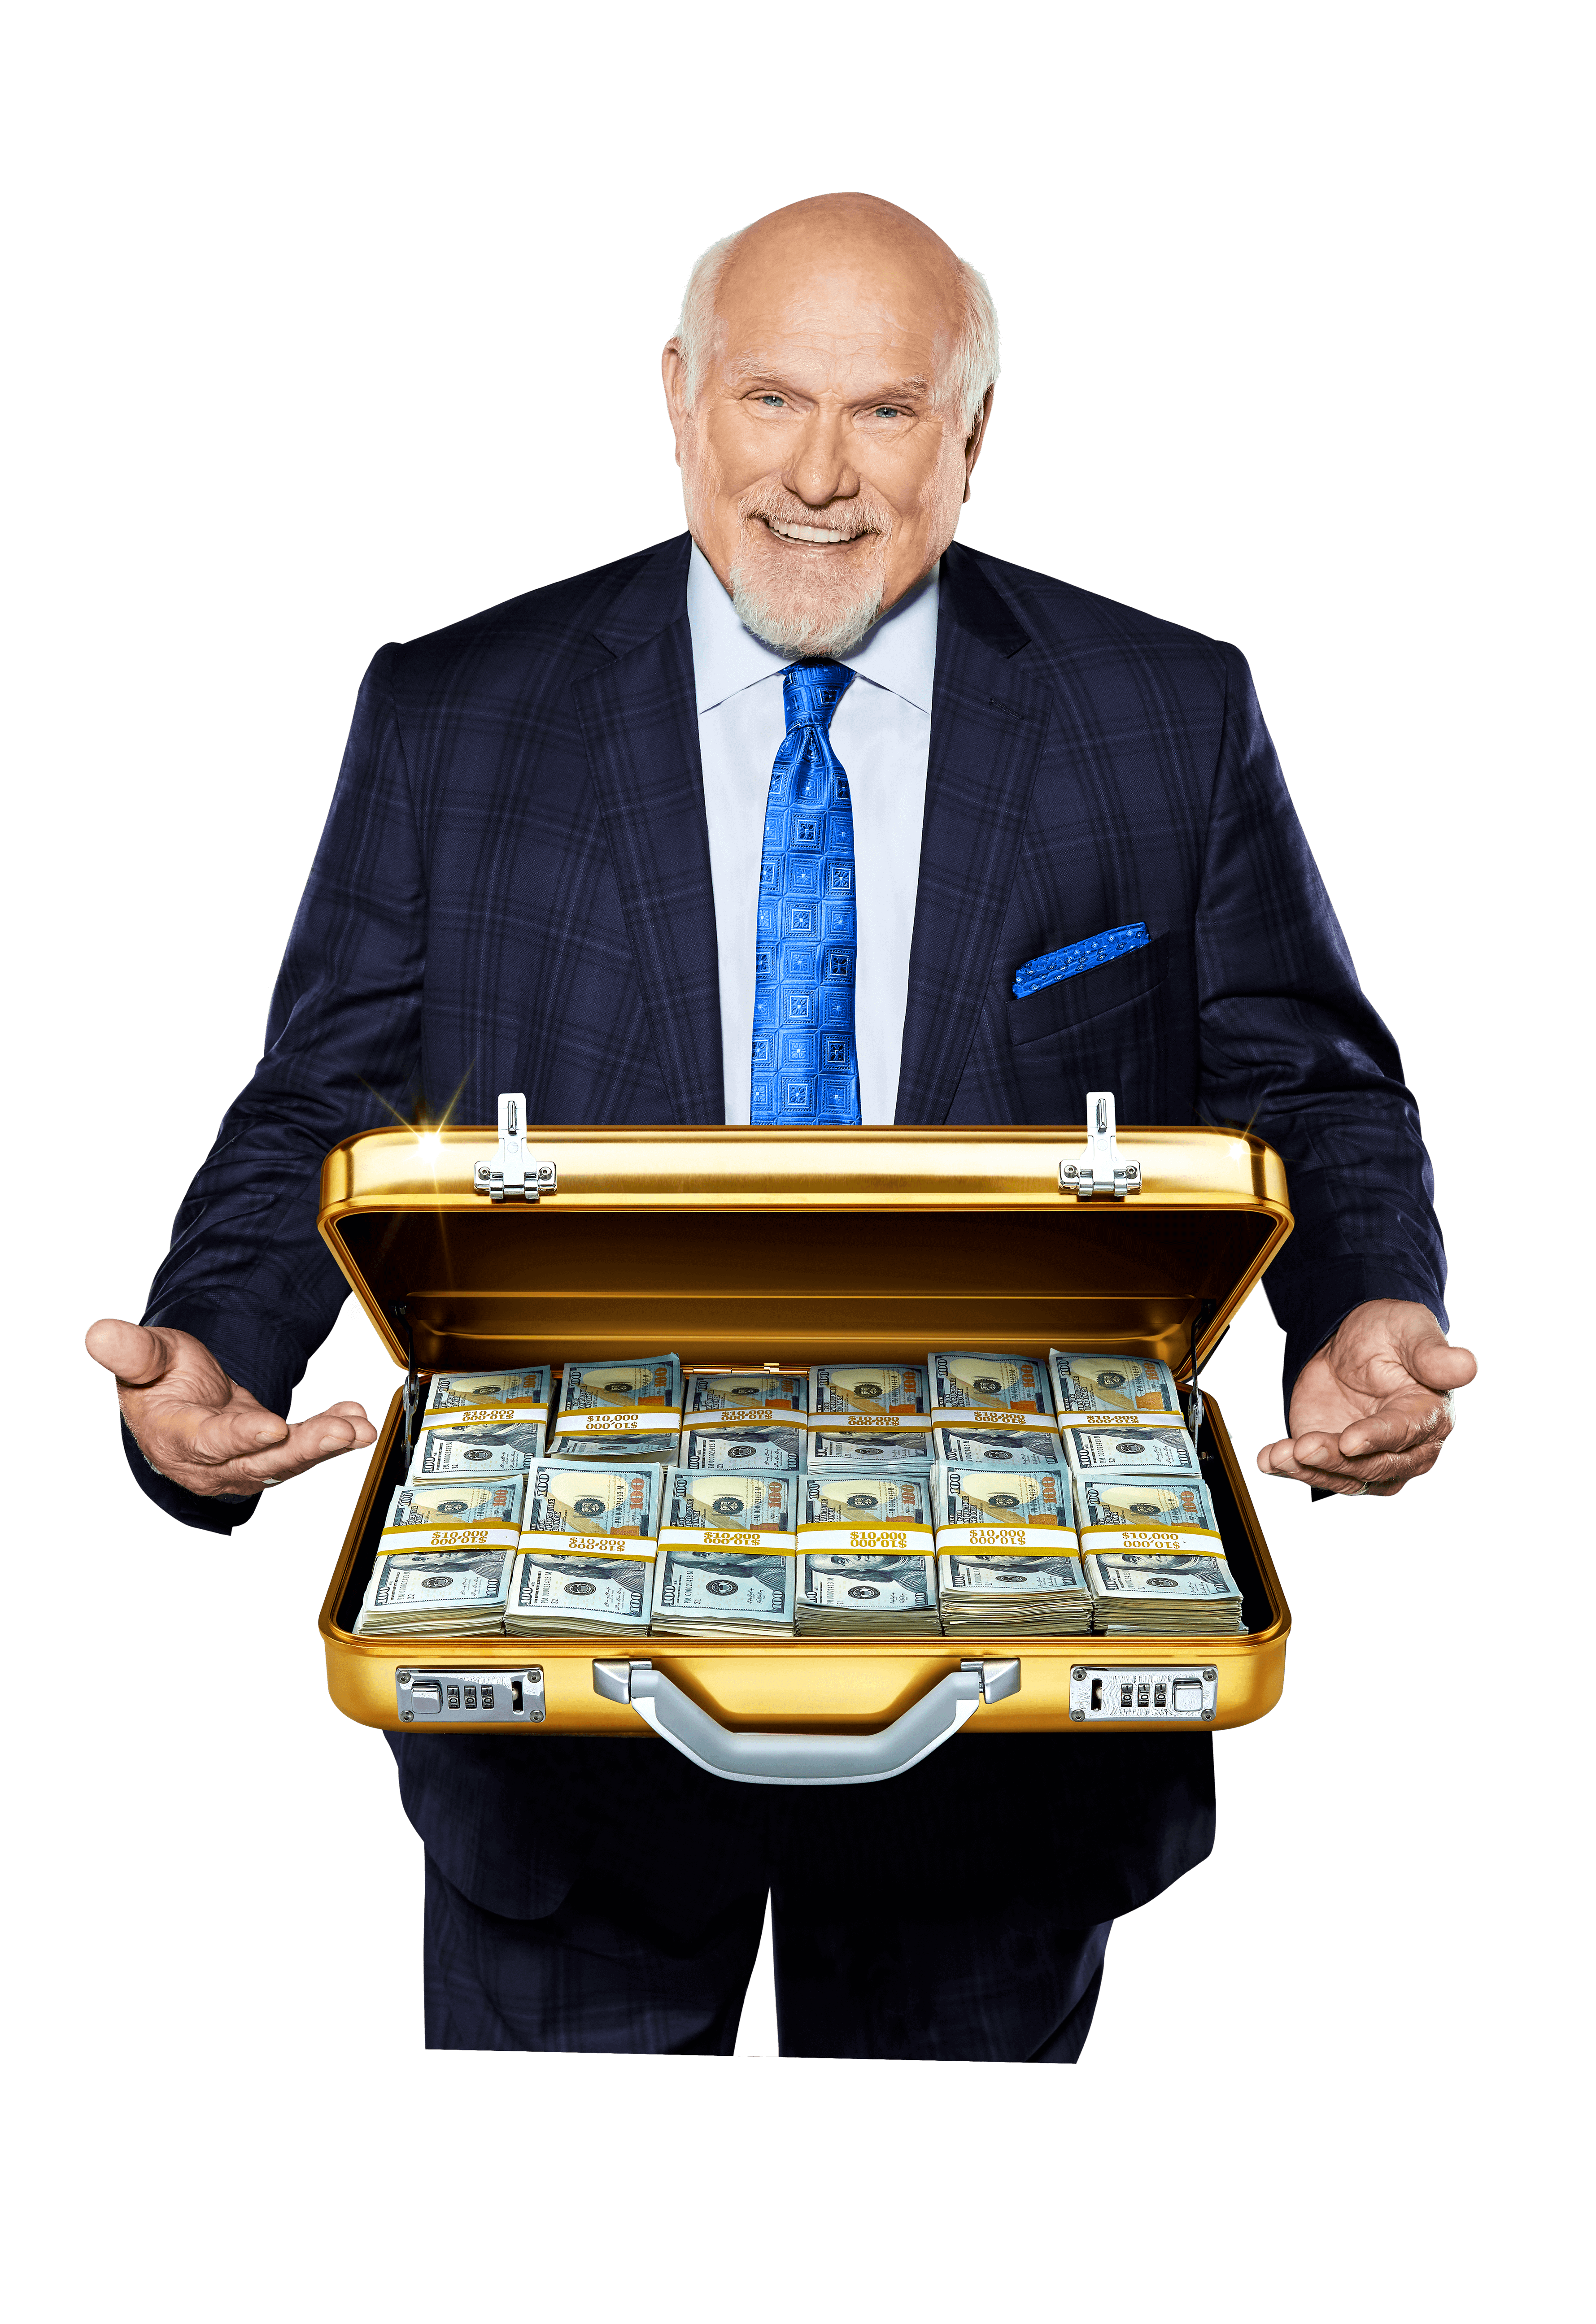 Terry shooting cash